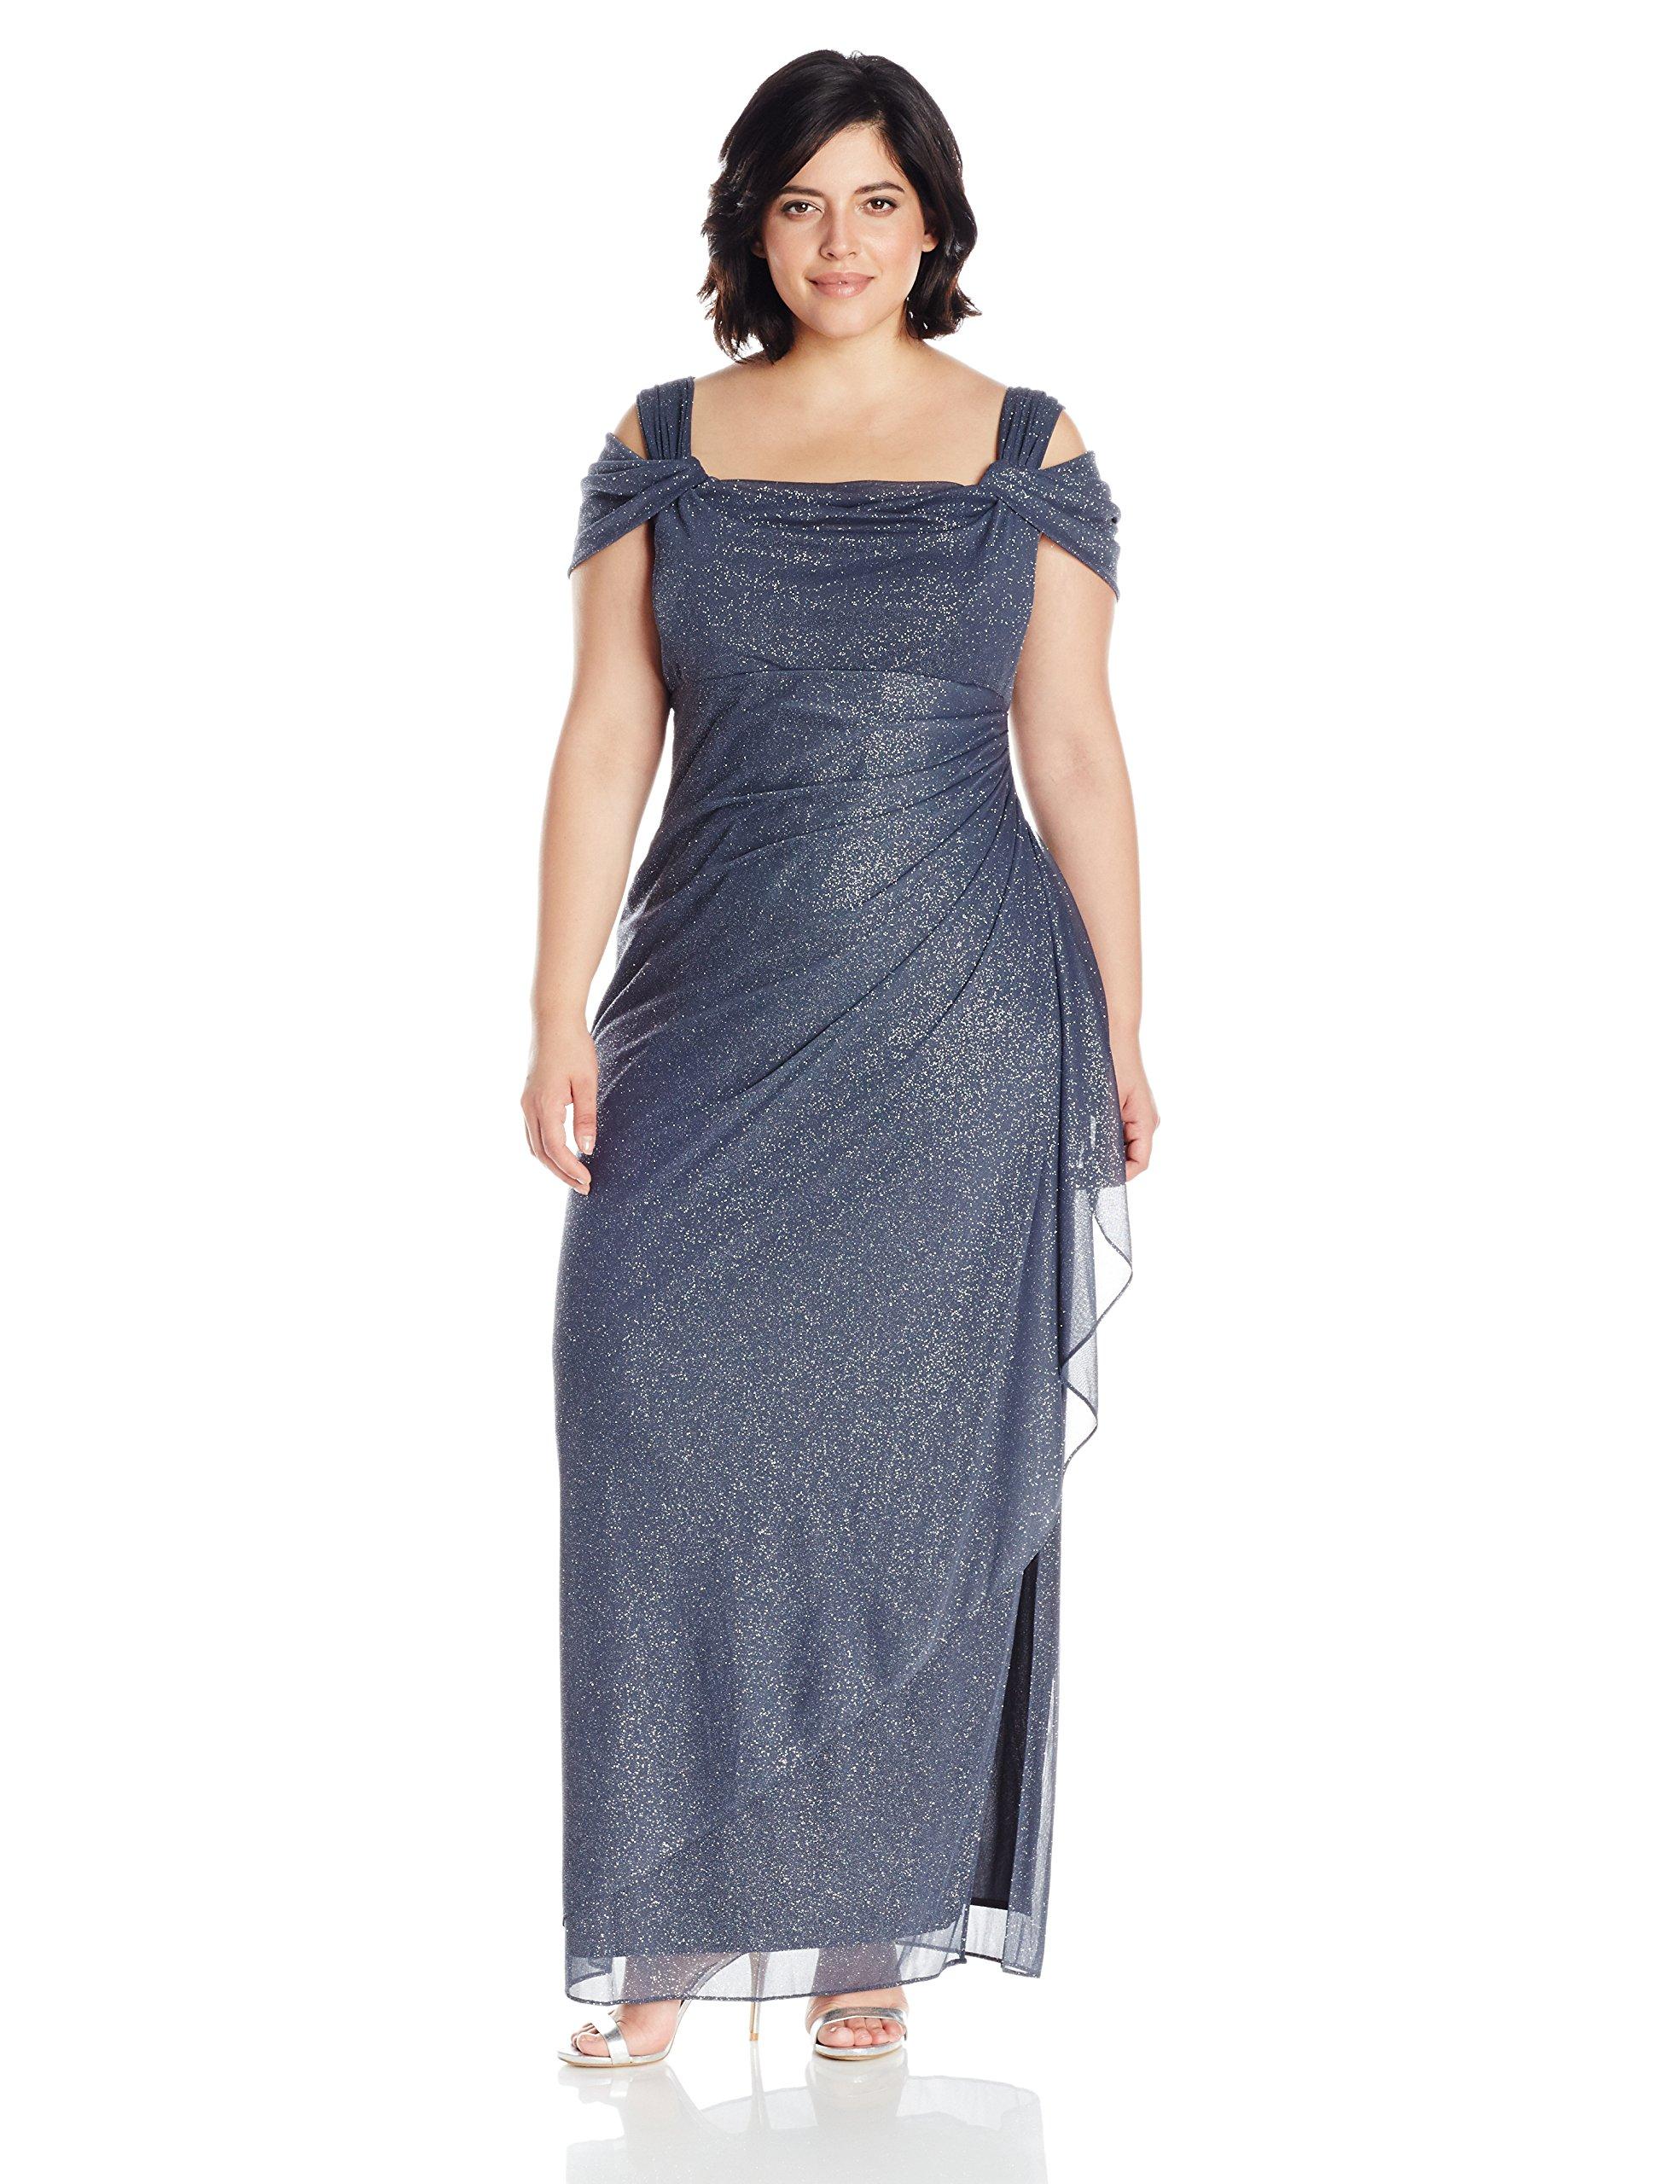 Alex Evenings Women's Plus Size Long Cold Shoulder Dress, Smoke, 18W by Alex Evenings